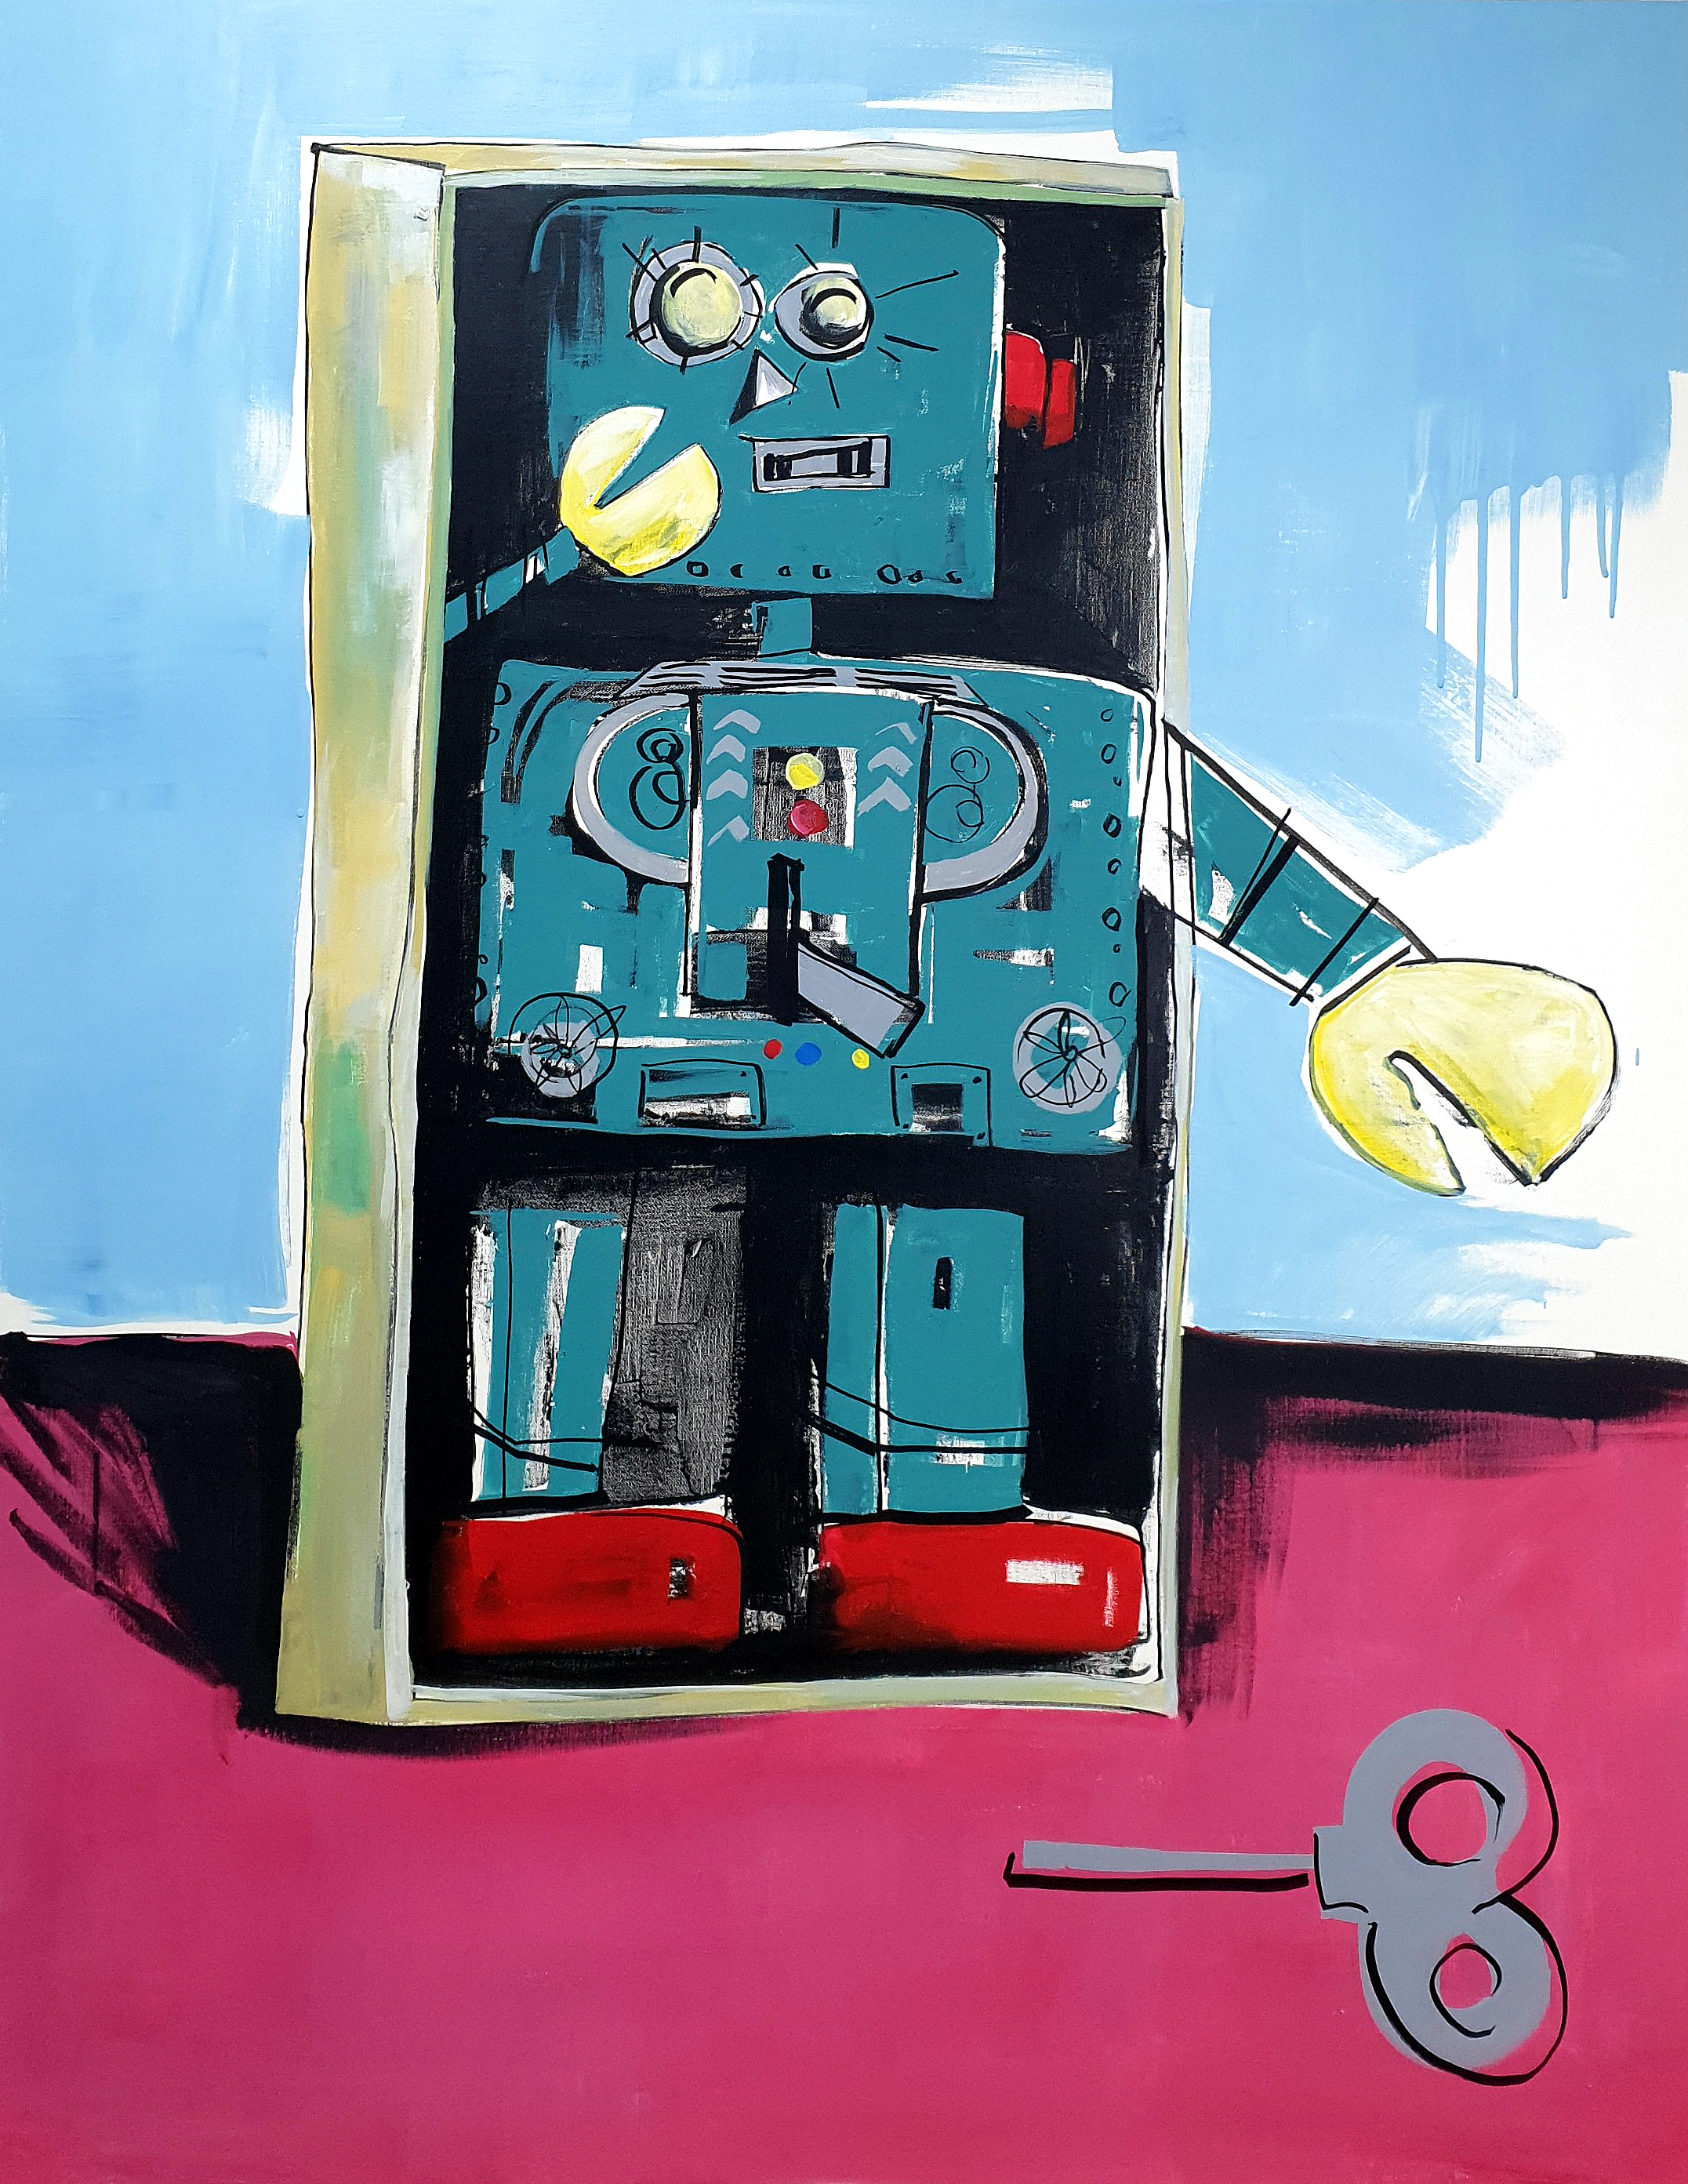 Robot unboxing series 01